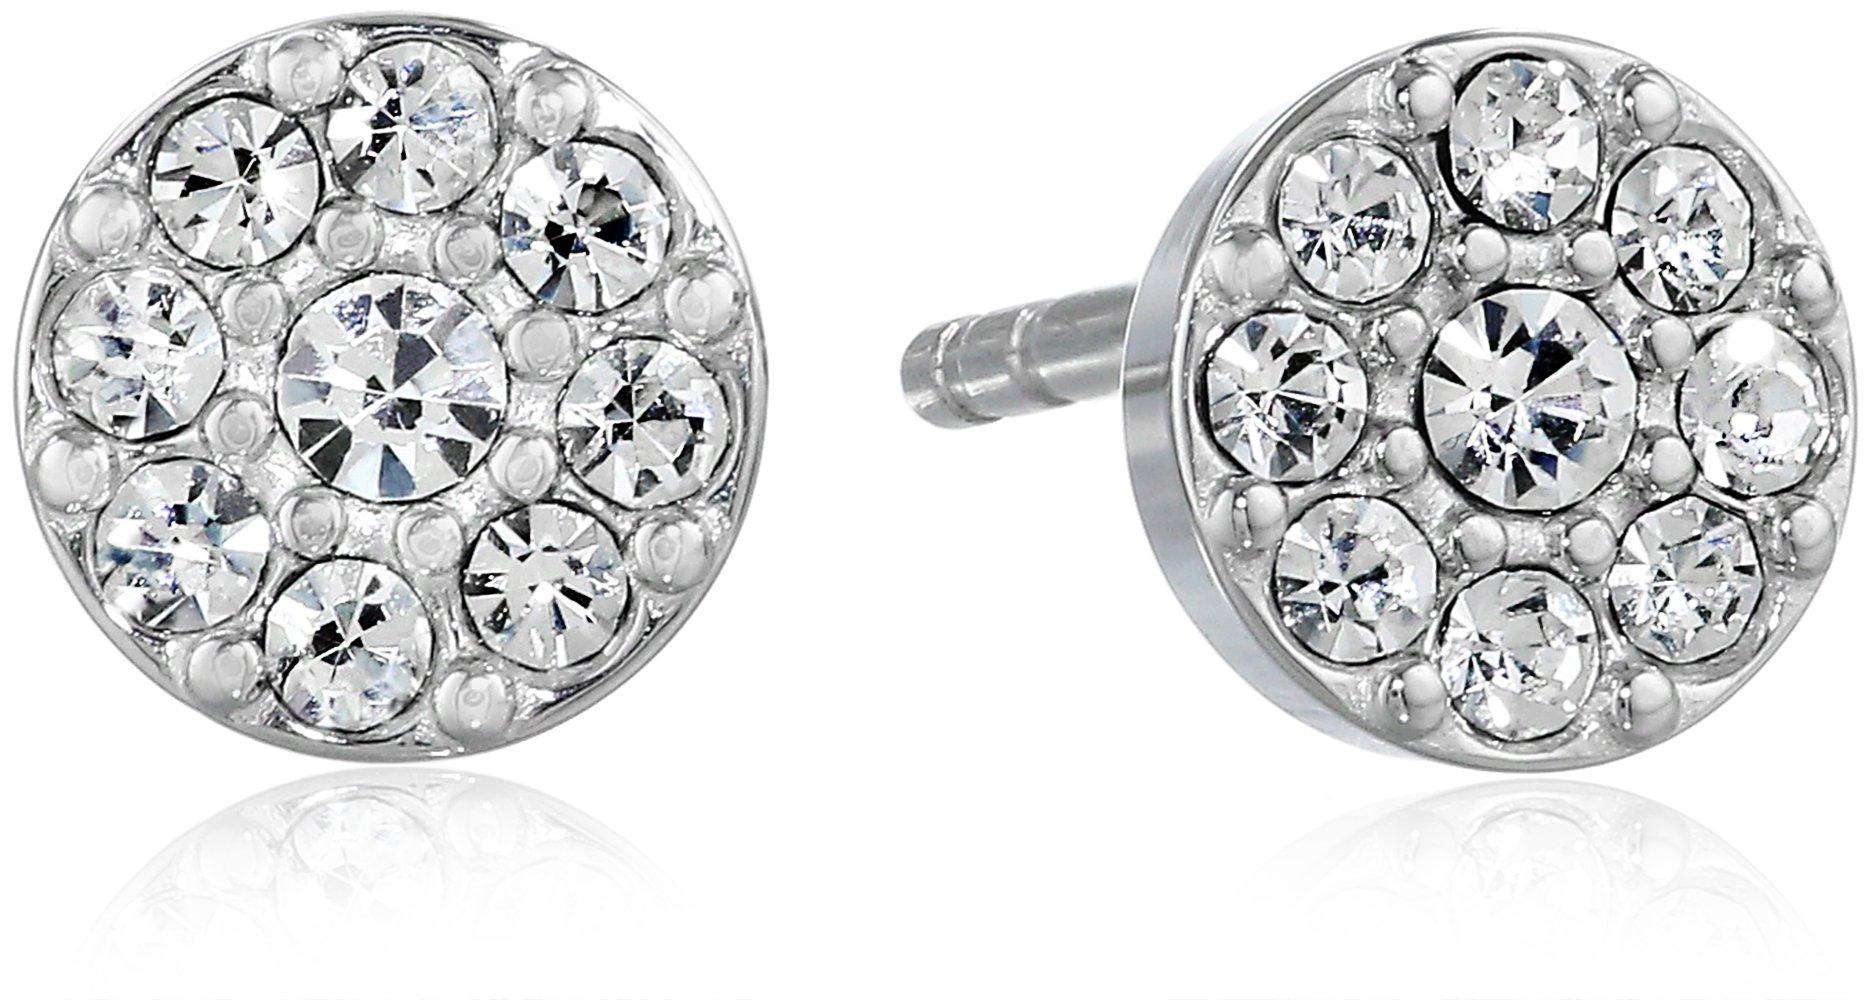 ویکالا · خرید  اصل اورجینال · خرید از آمازون · Fossil Disc Silver Stud Earrings wekala · ویکالا